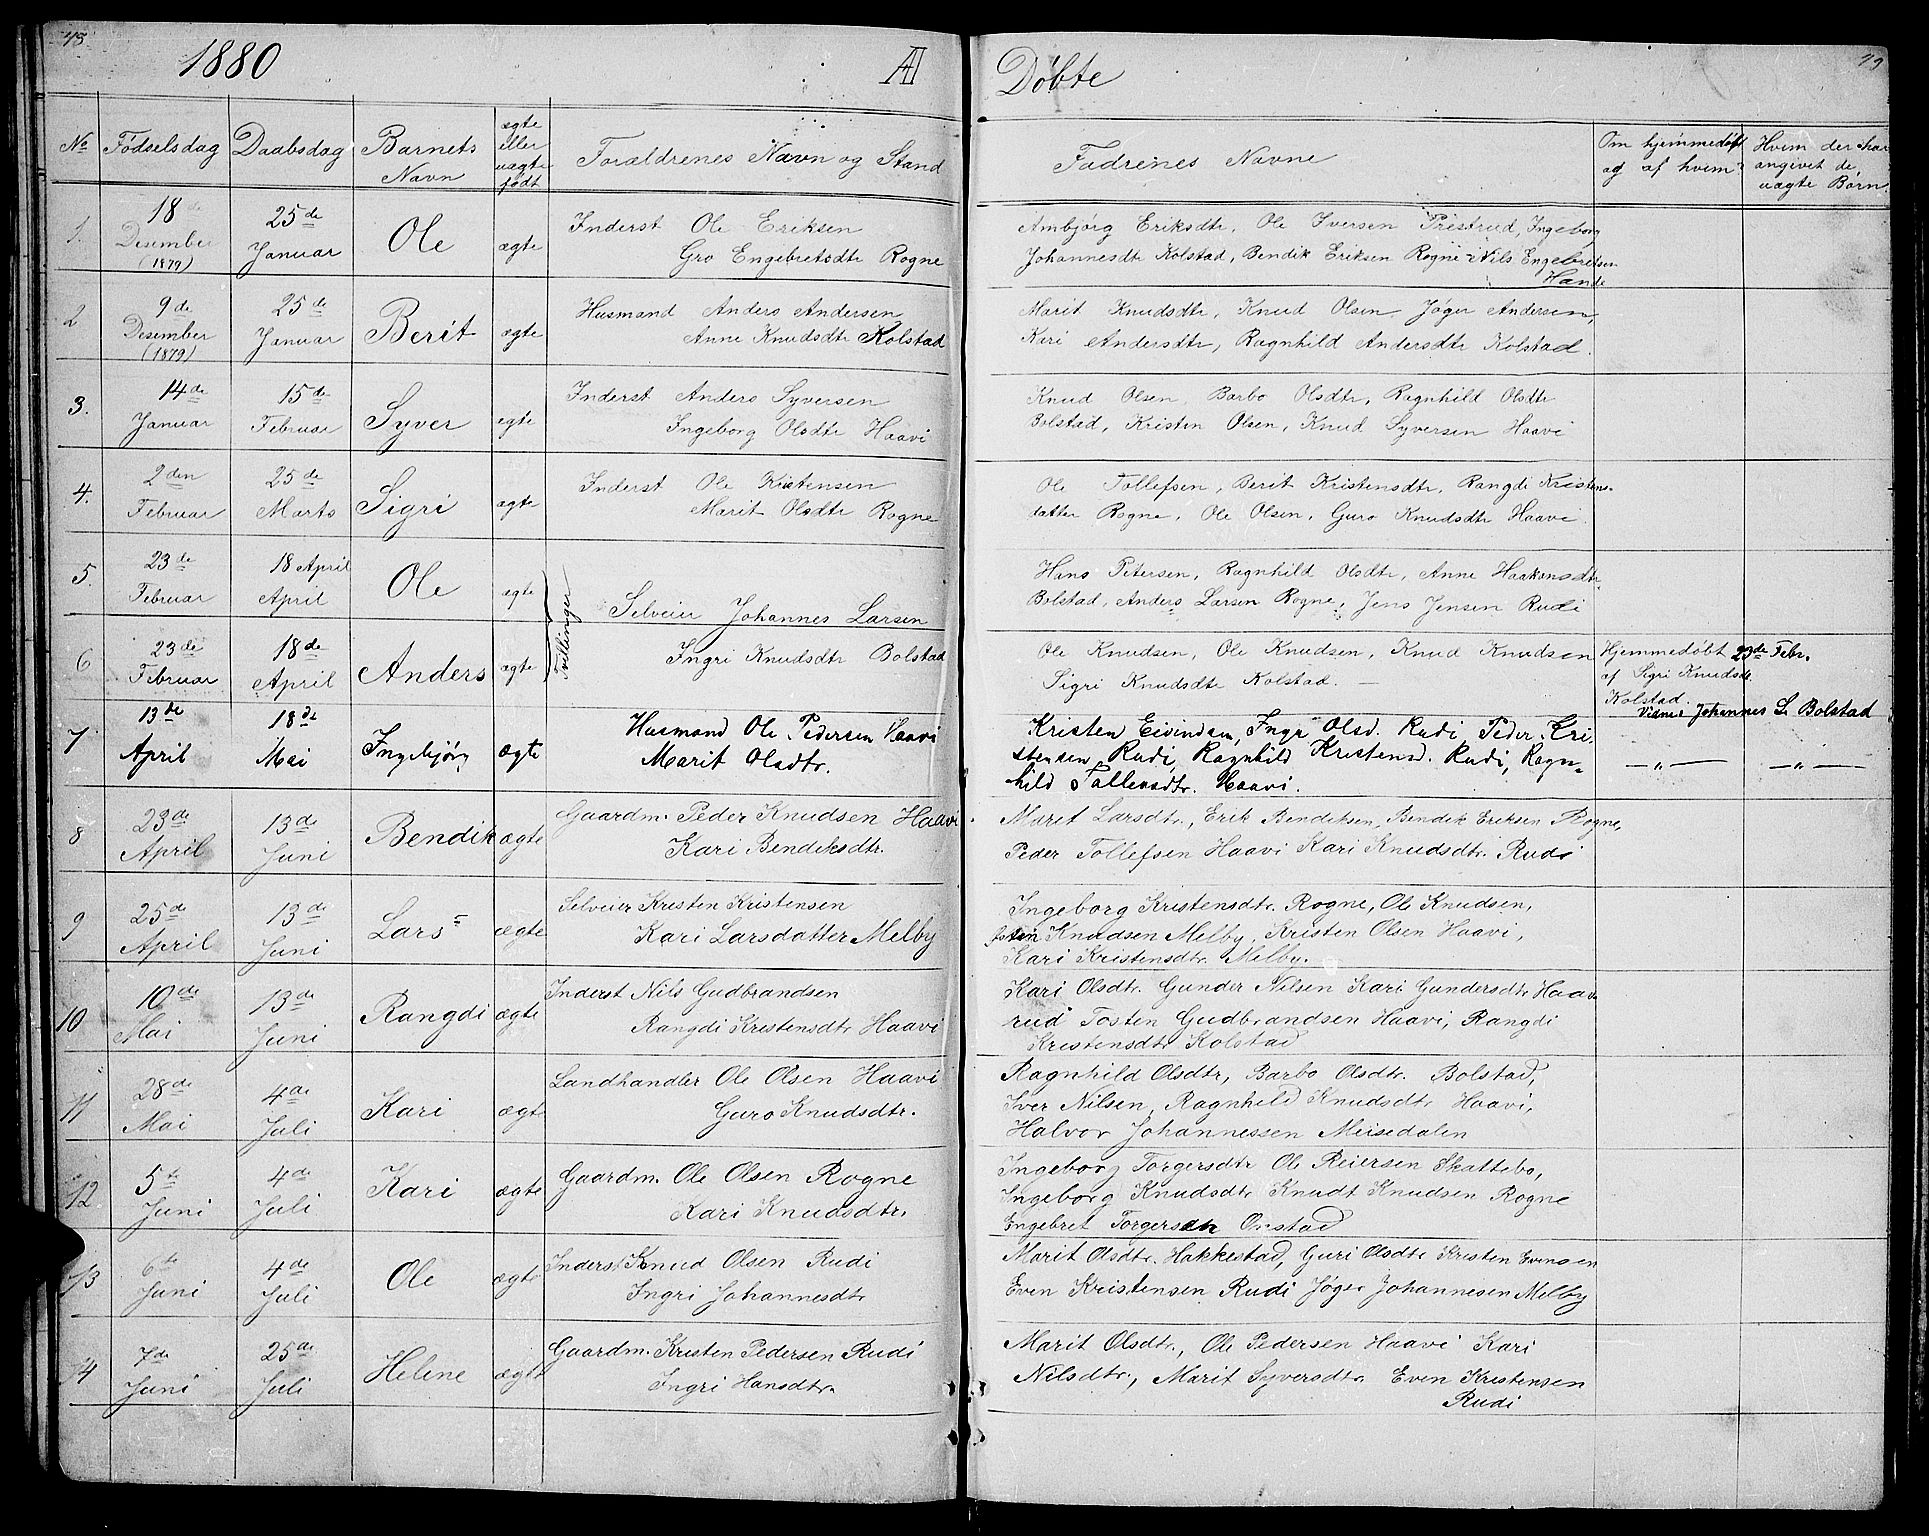 SAH, Øystre Slidre prestekontor, Klokkerbok nr. 3, 1866-1886, s. 48-49